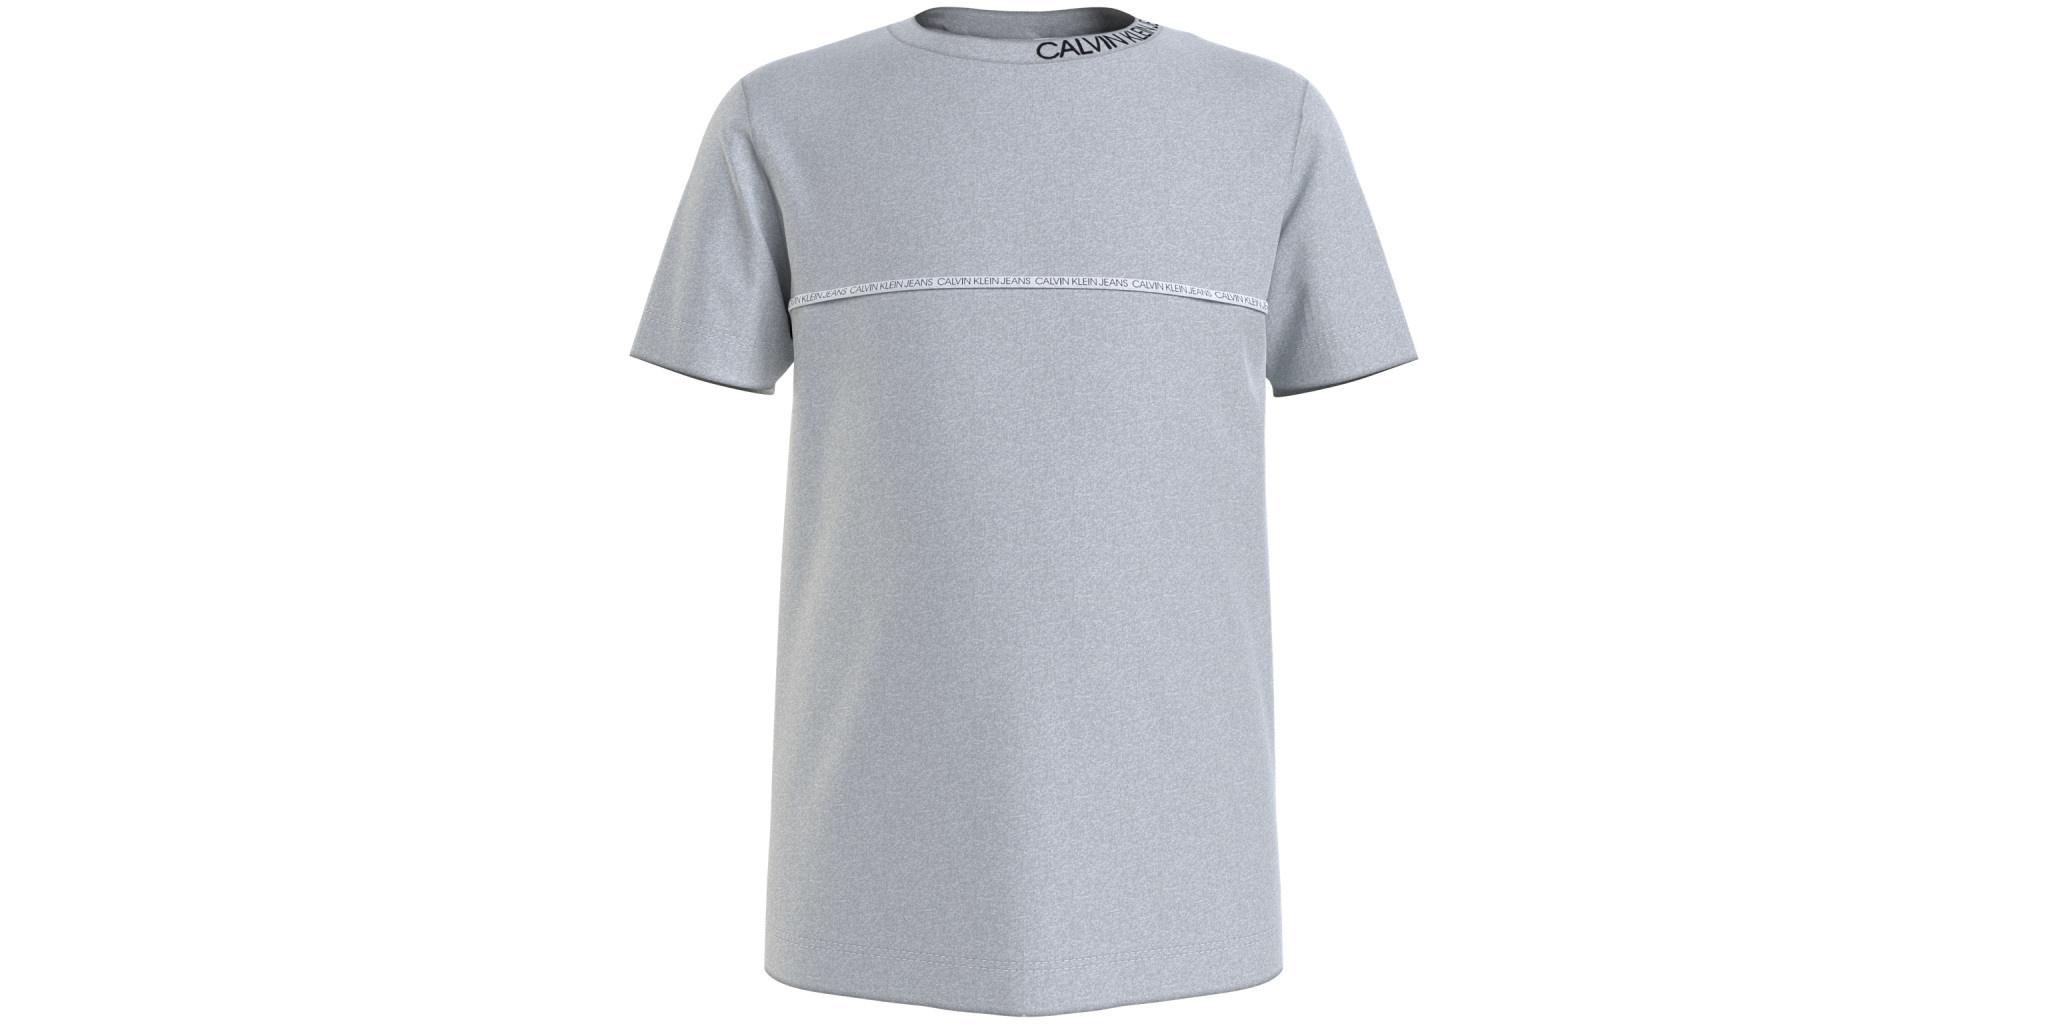 Calvin klein Calvin Klein Shirt Light Grey Heather IB0IB00695 Z21B